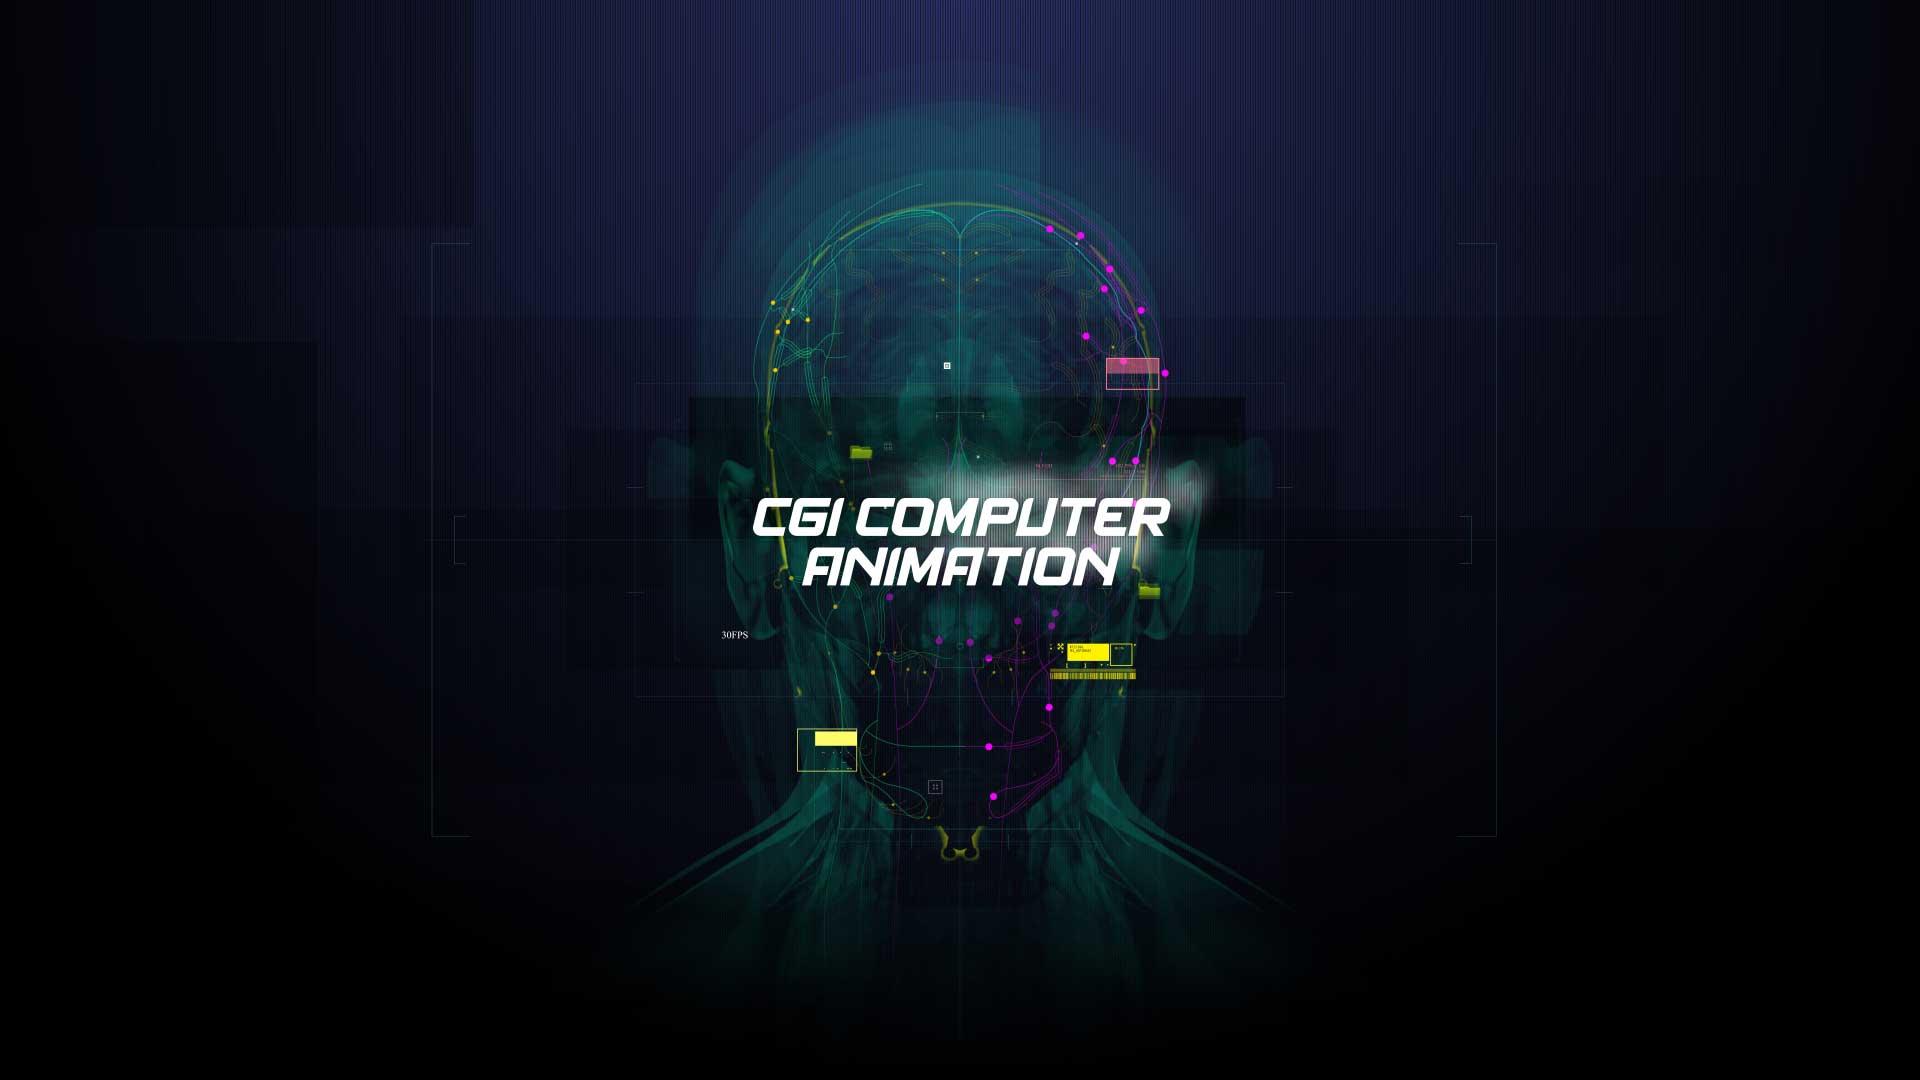 CGI VISUALISATION Company